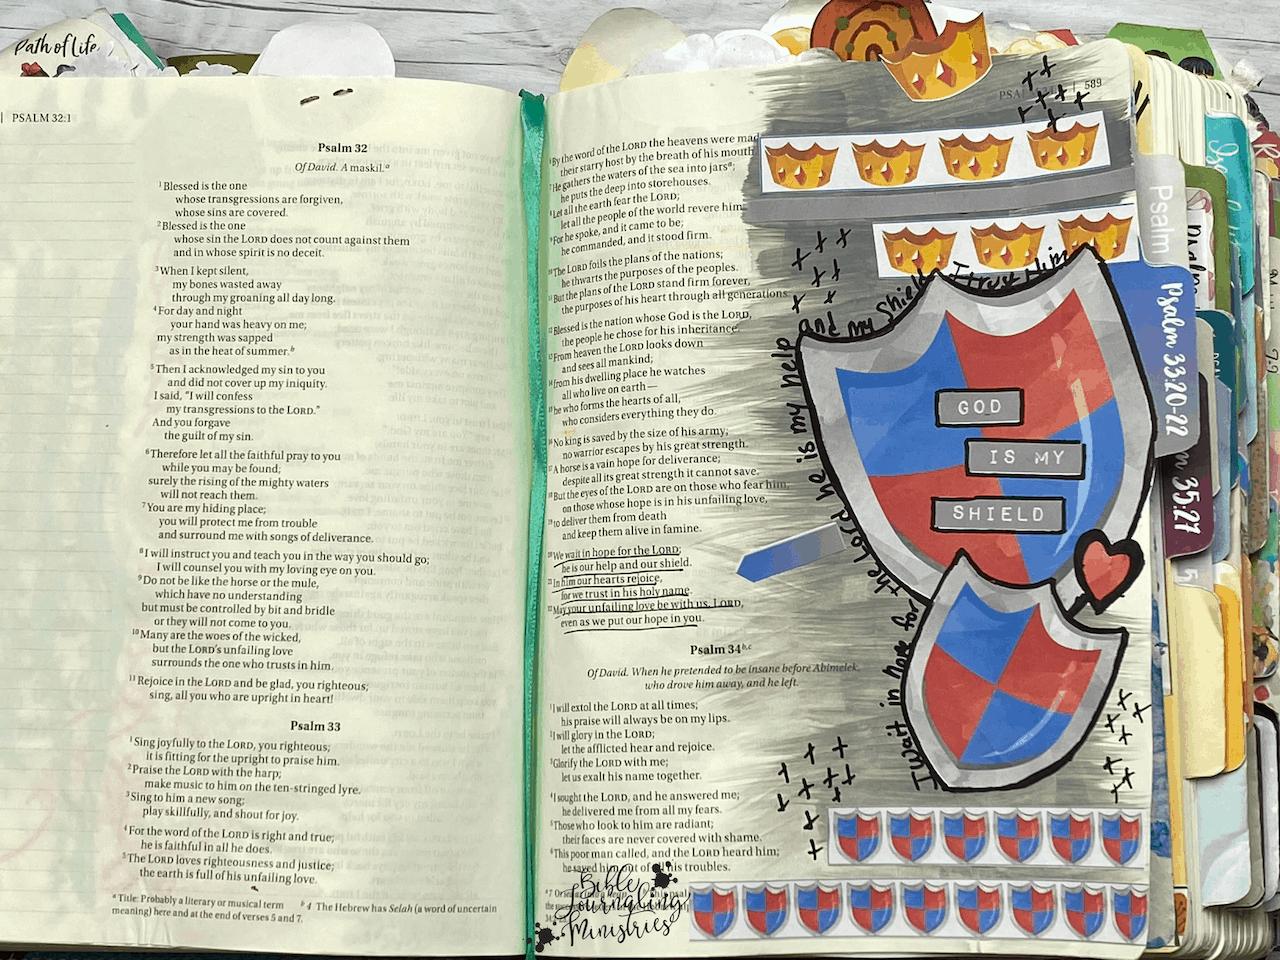 Psalm 33:20-22